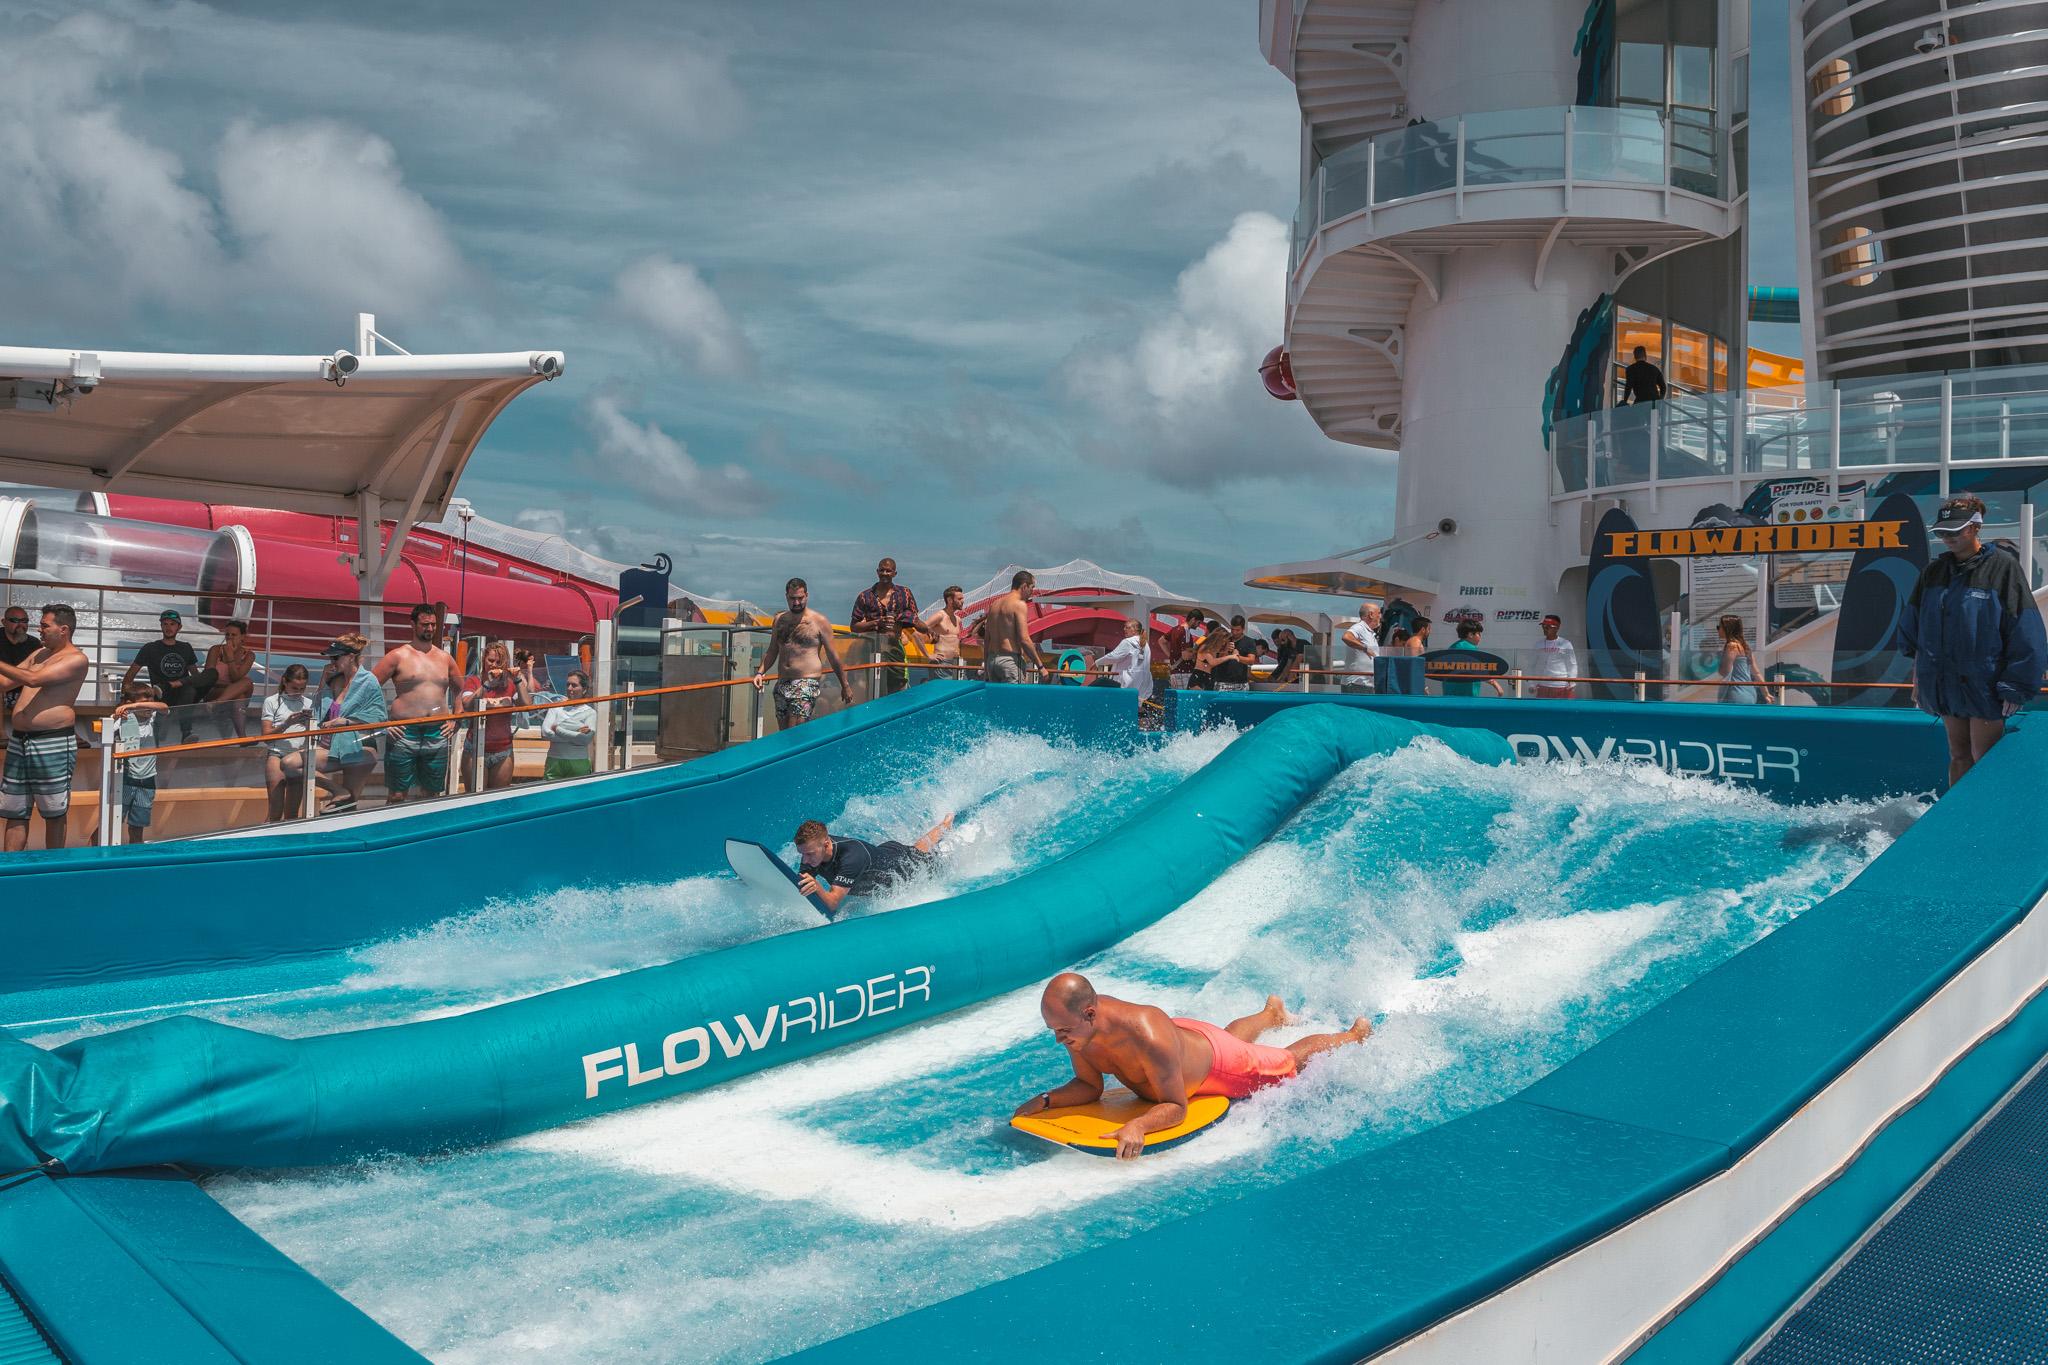 Flowrider ~ Cruise Review: Royal Caribbean Navigator of the Seas